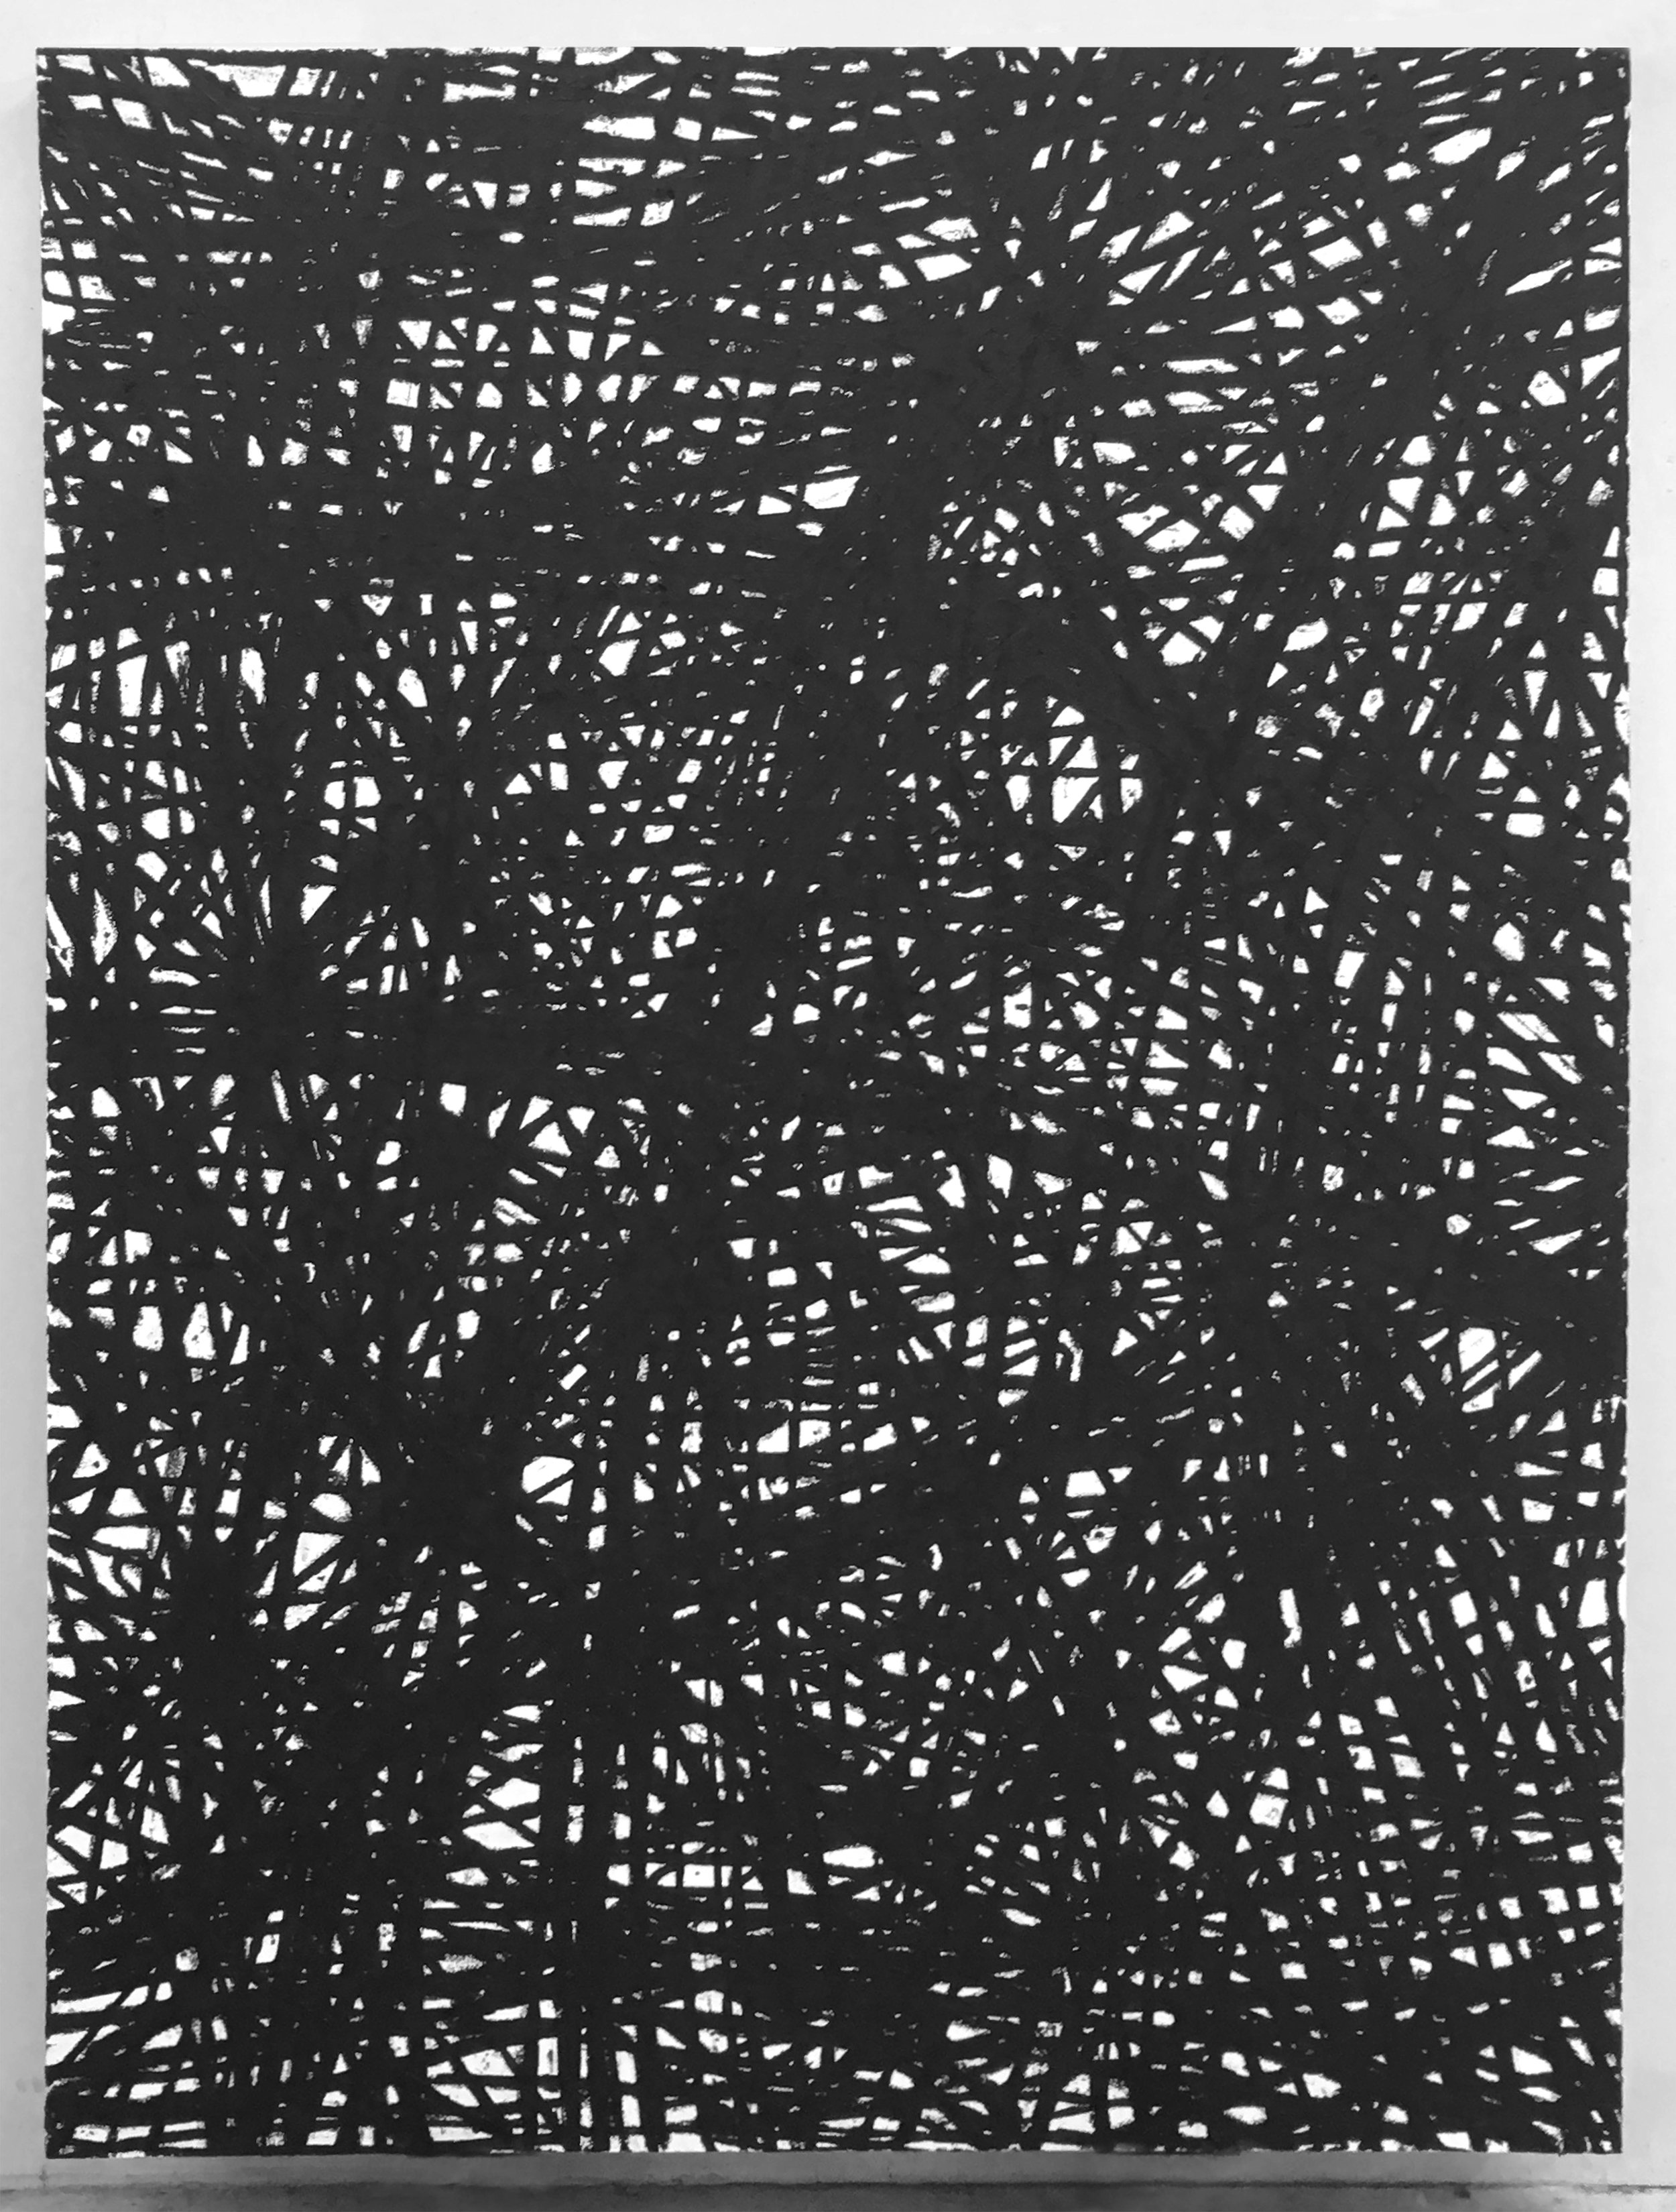 Frenesi, 2016, oilbar on canvas, 74 x 56 x 3 inches